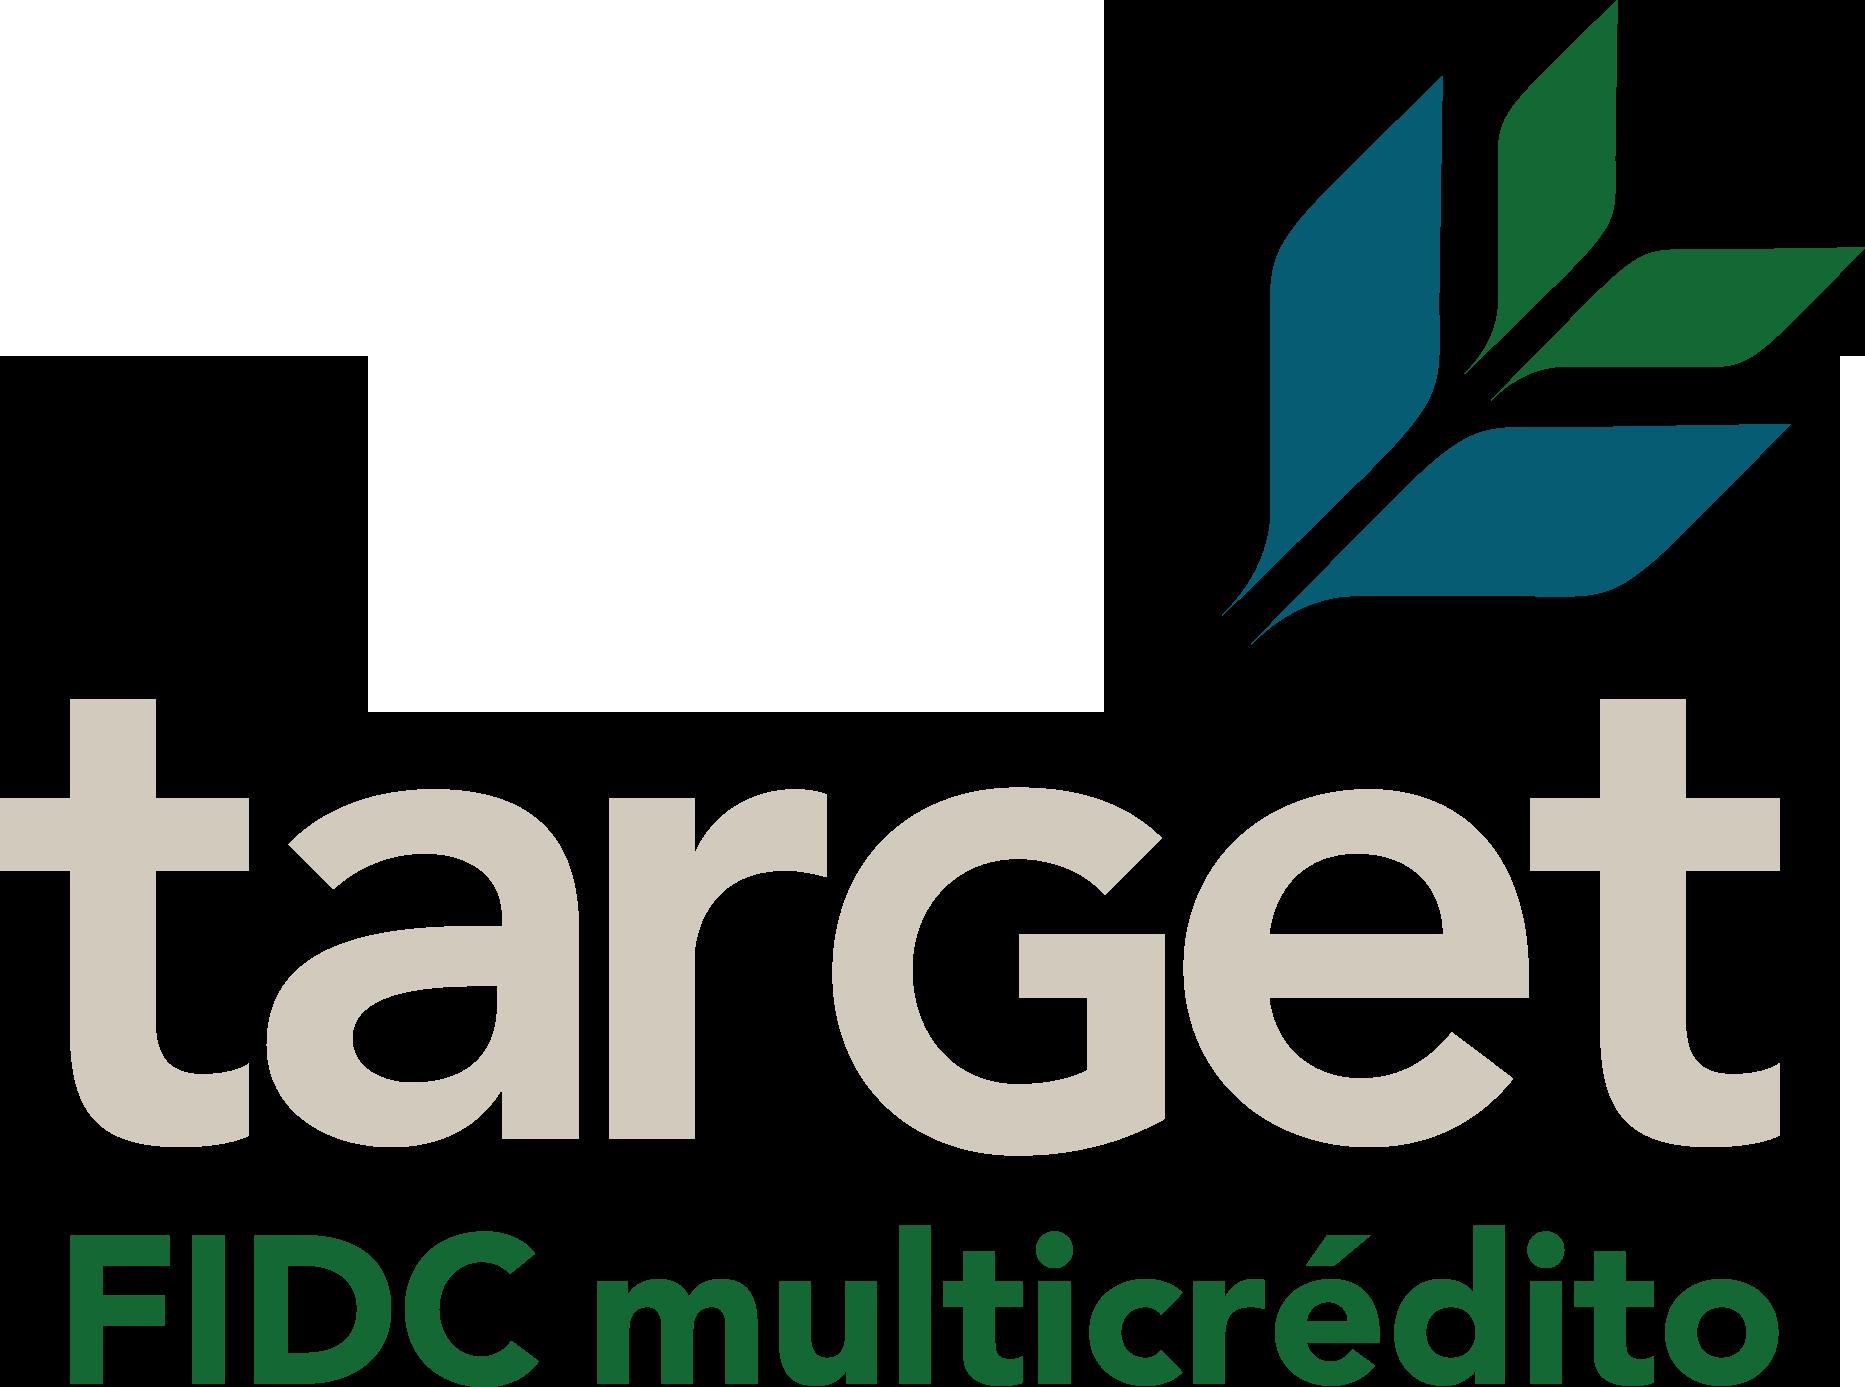 logo_target_fidc.png